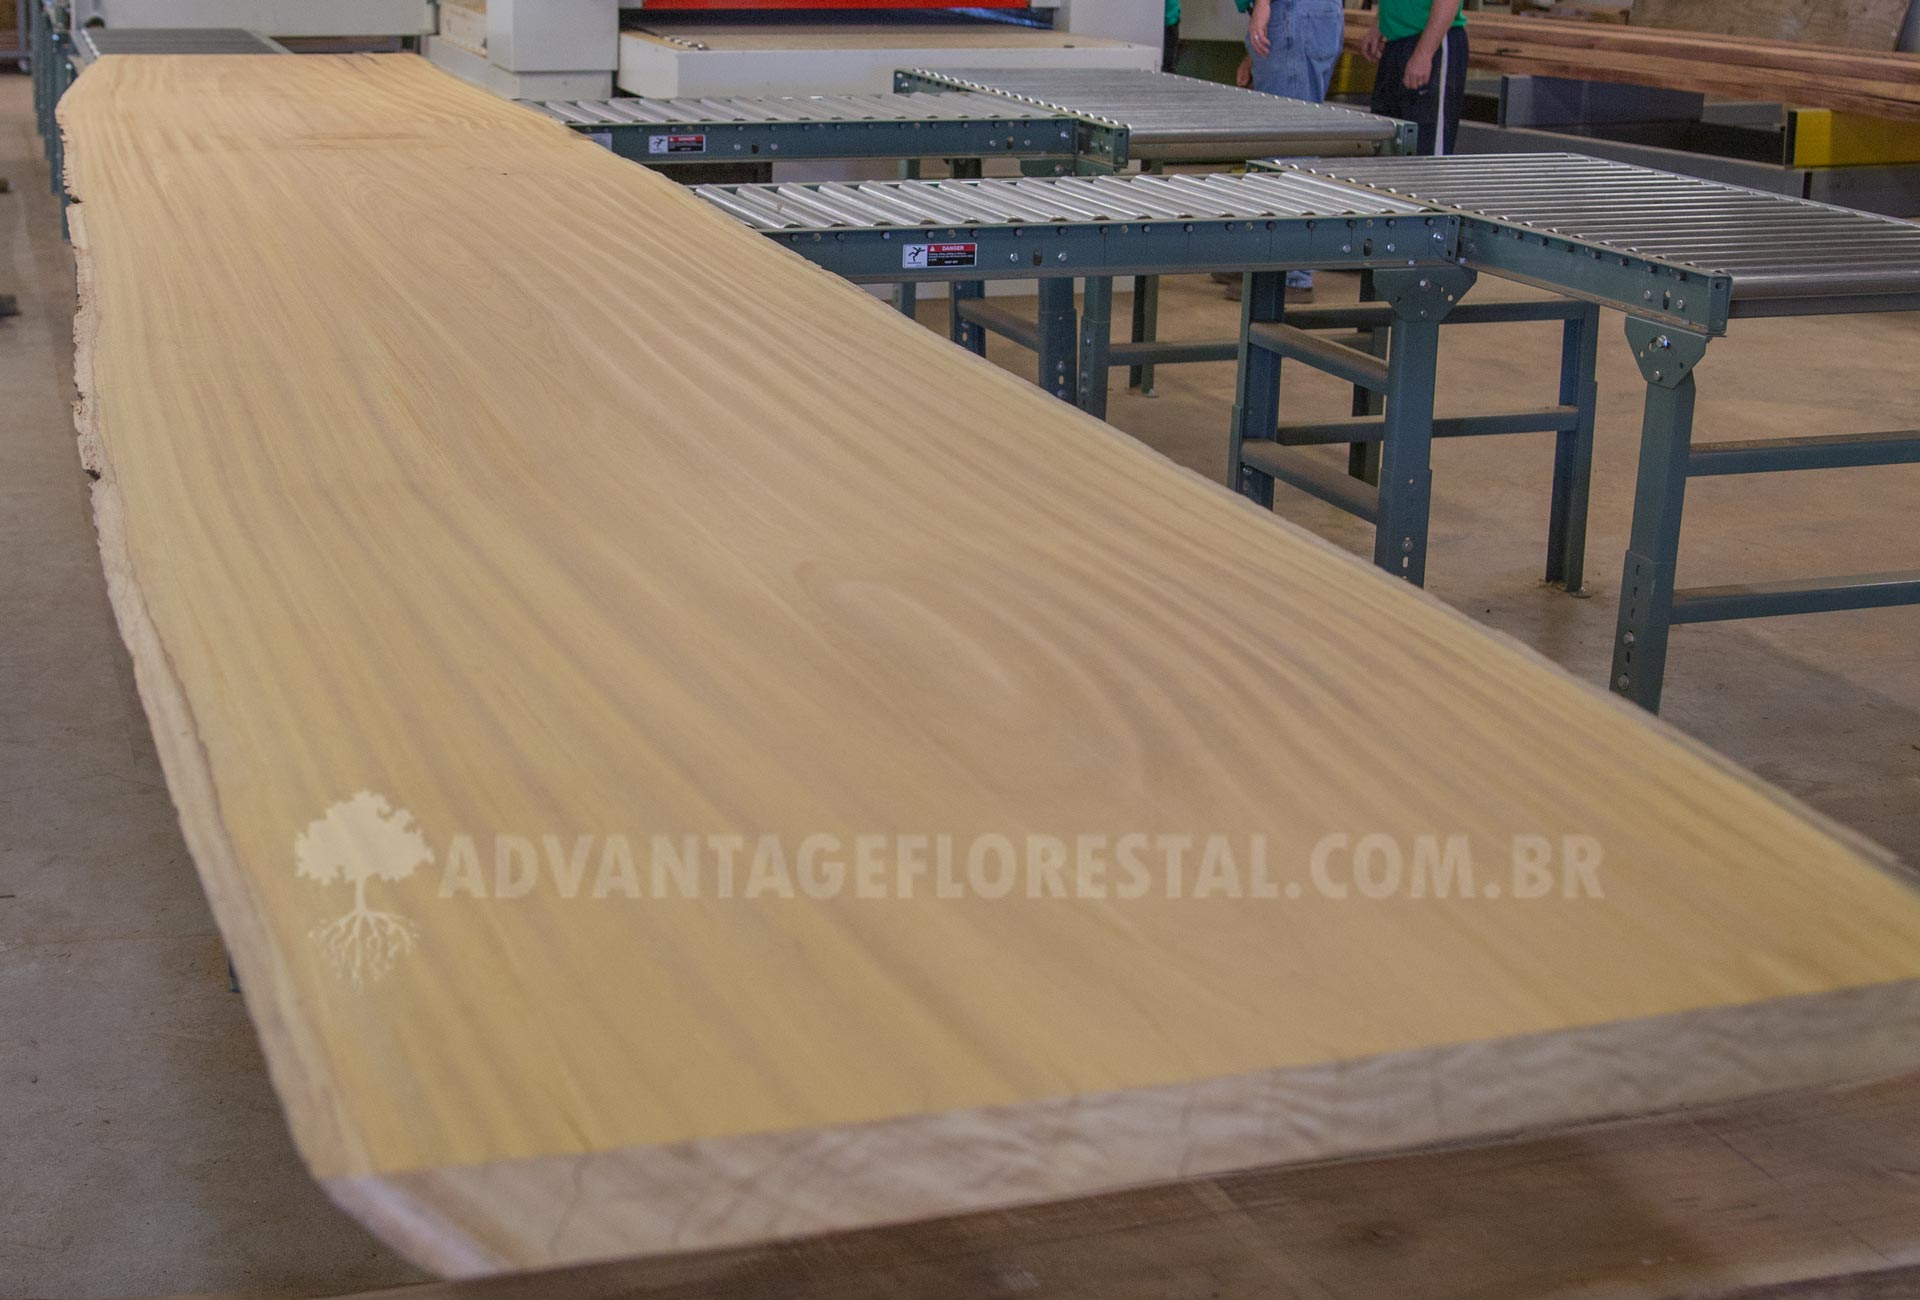 Tatajuba - Hardwood lumber products